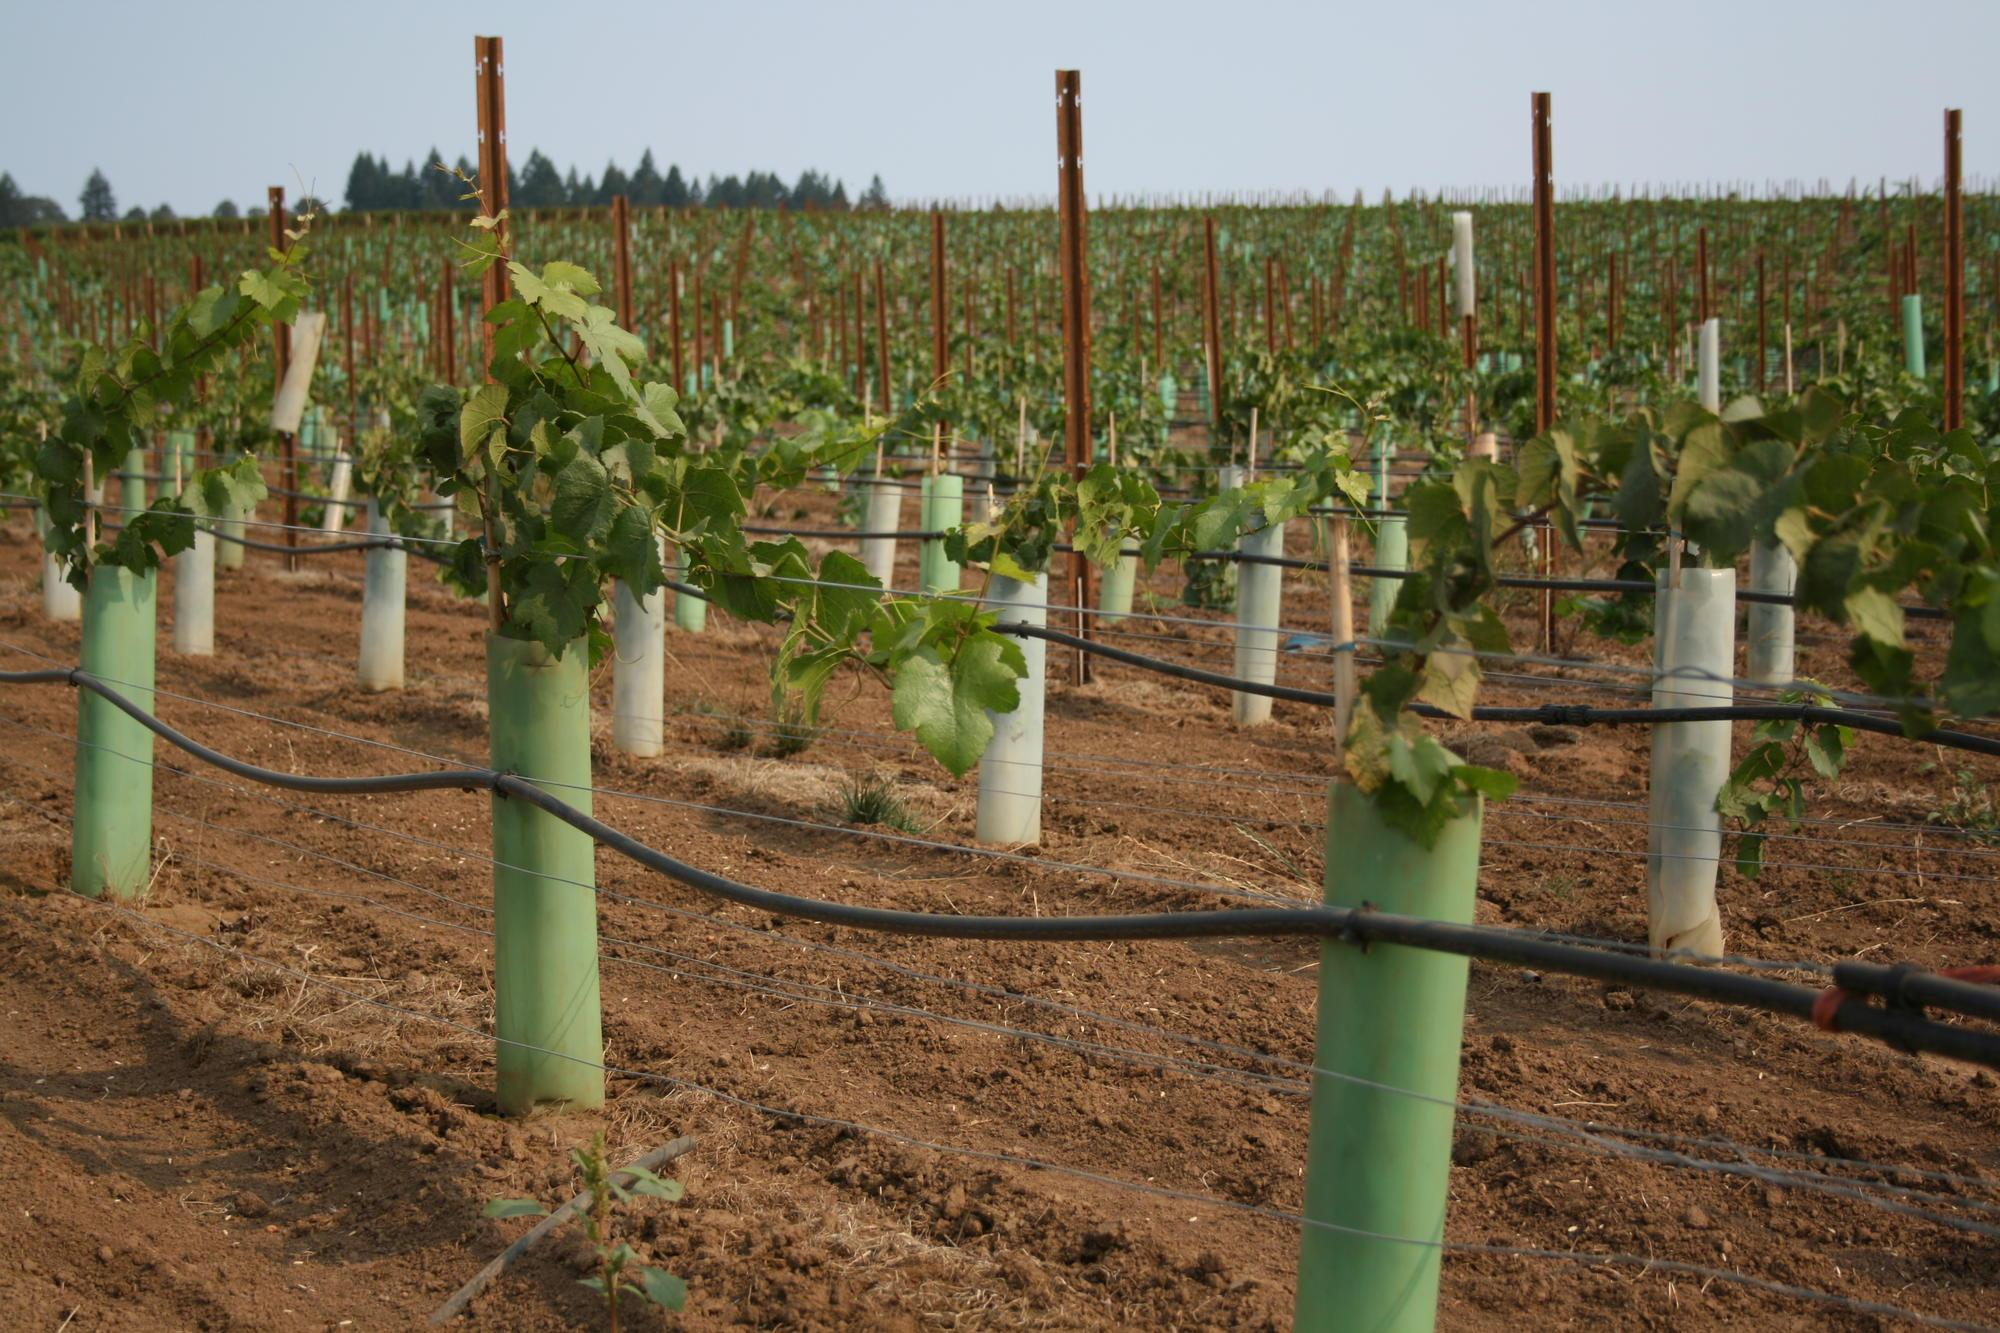 How To Establish A Wine Grape Vineyard Osu Extension Service